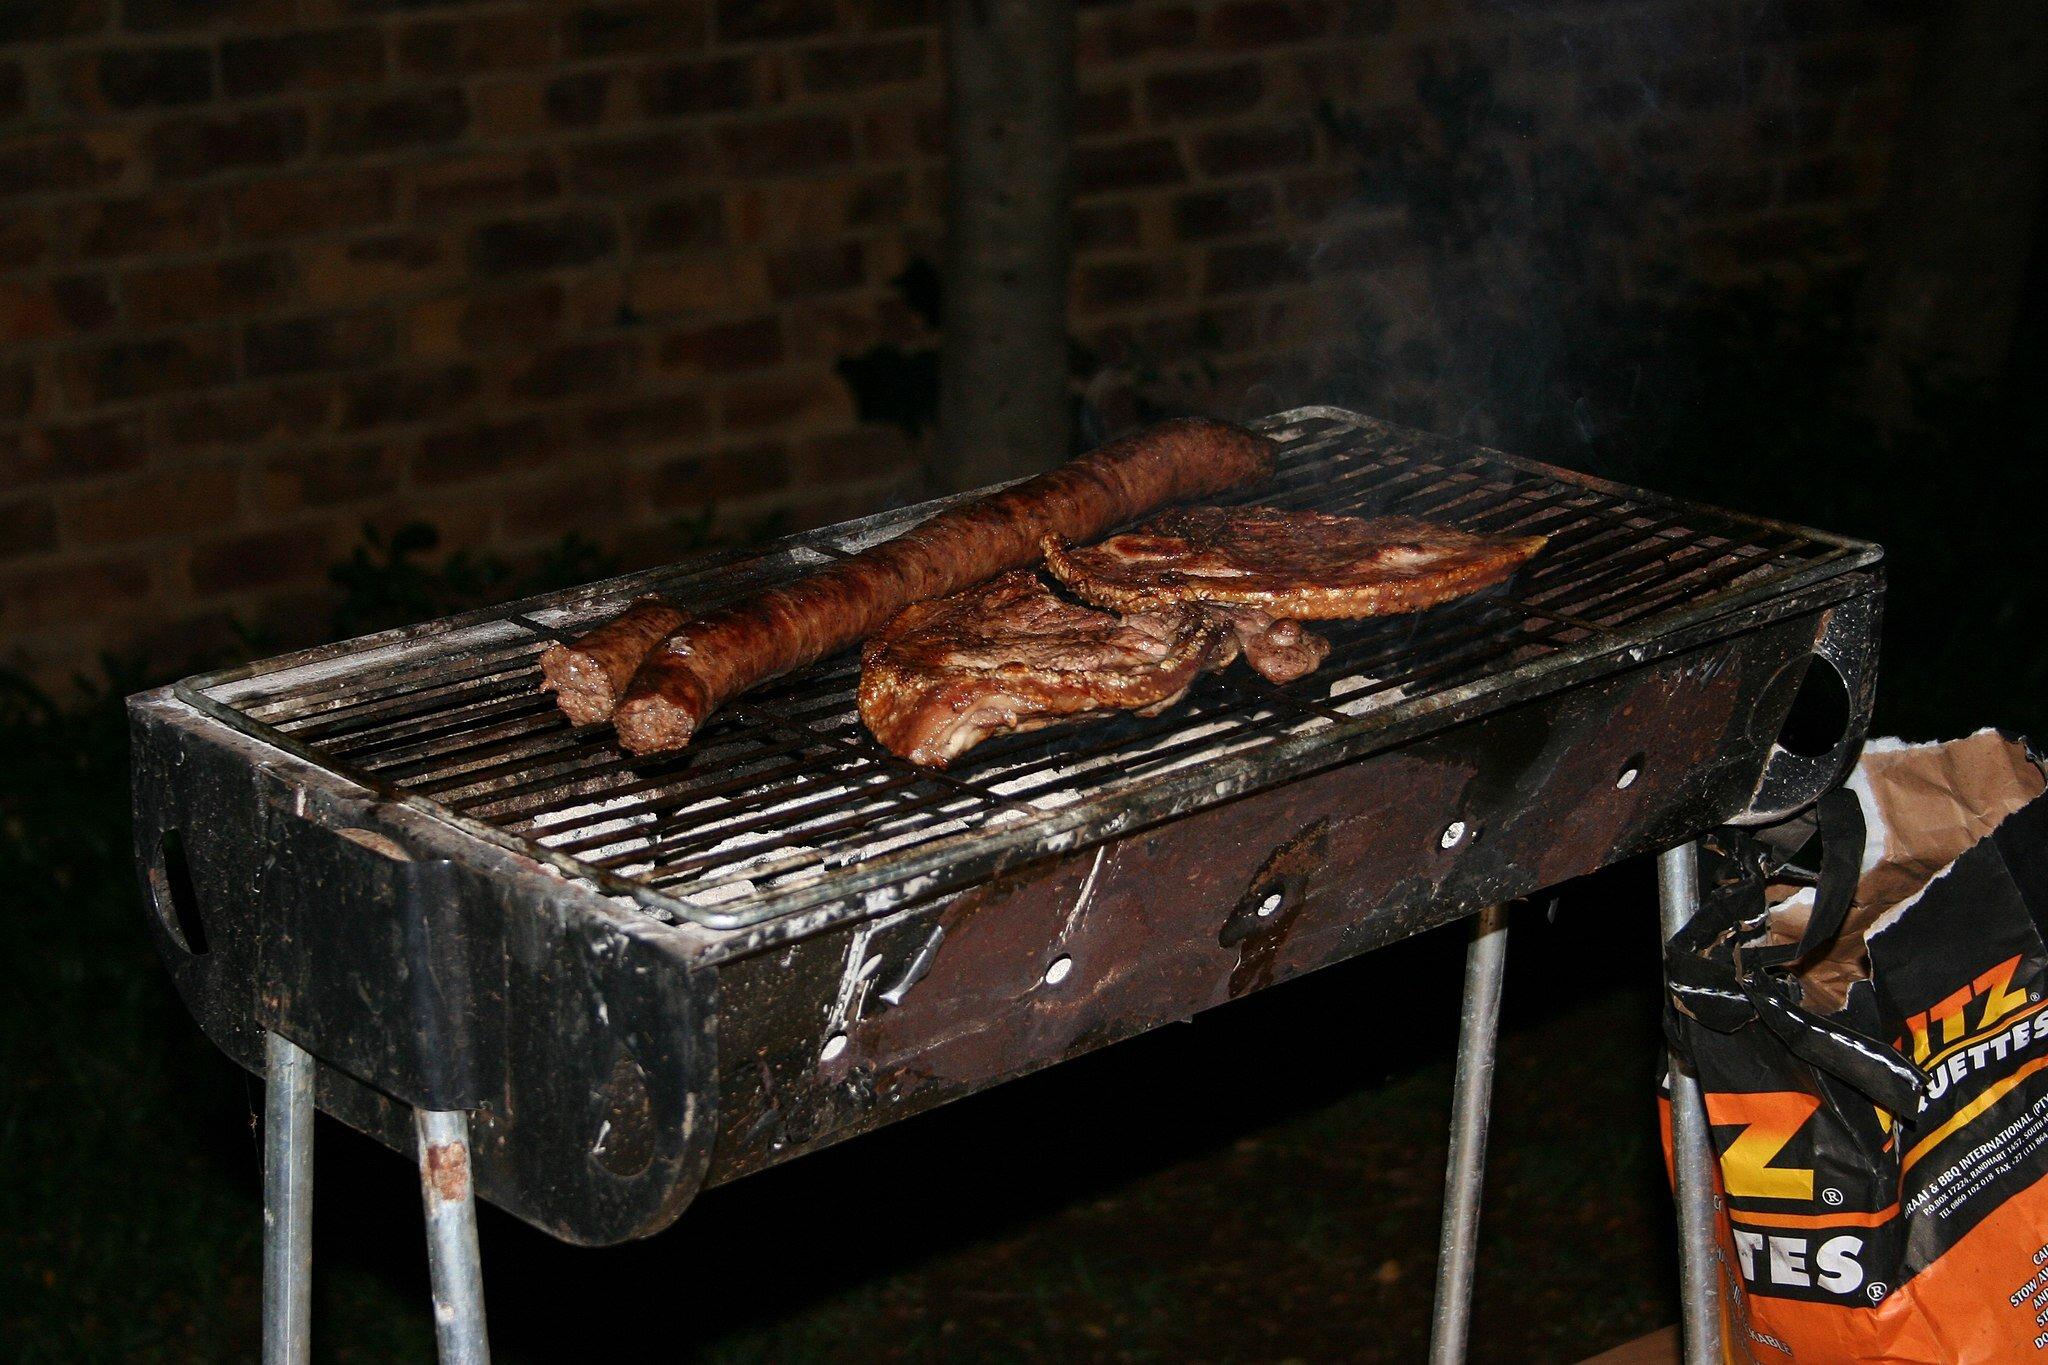 Braai是一个南非荷兰语单词,chesa nyama是它的isiZulu等价词,它不仅描述了烧煤、直接加热烹饪方法、实现这种烹饪方法的设备以及提供这种烹饪方法的非正式餐厅,还描述了通常发生的广受欢迎的社交活动。Bothar通过Wikimedia Commons在公共领域的英文维基百科上拍摄的照片。